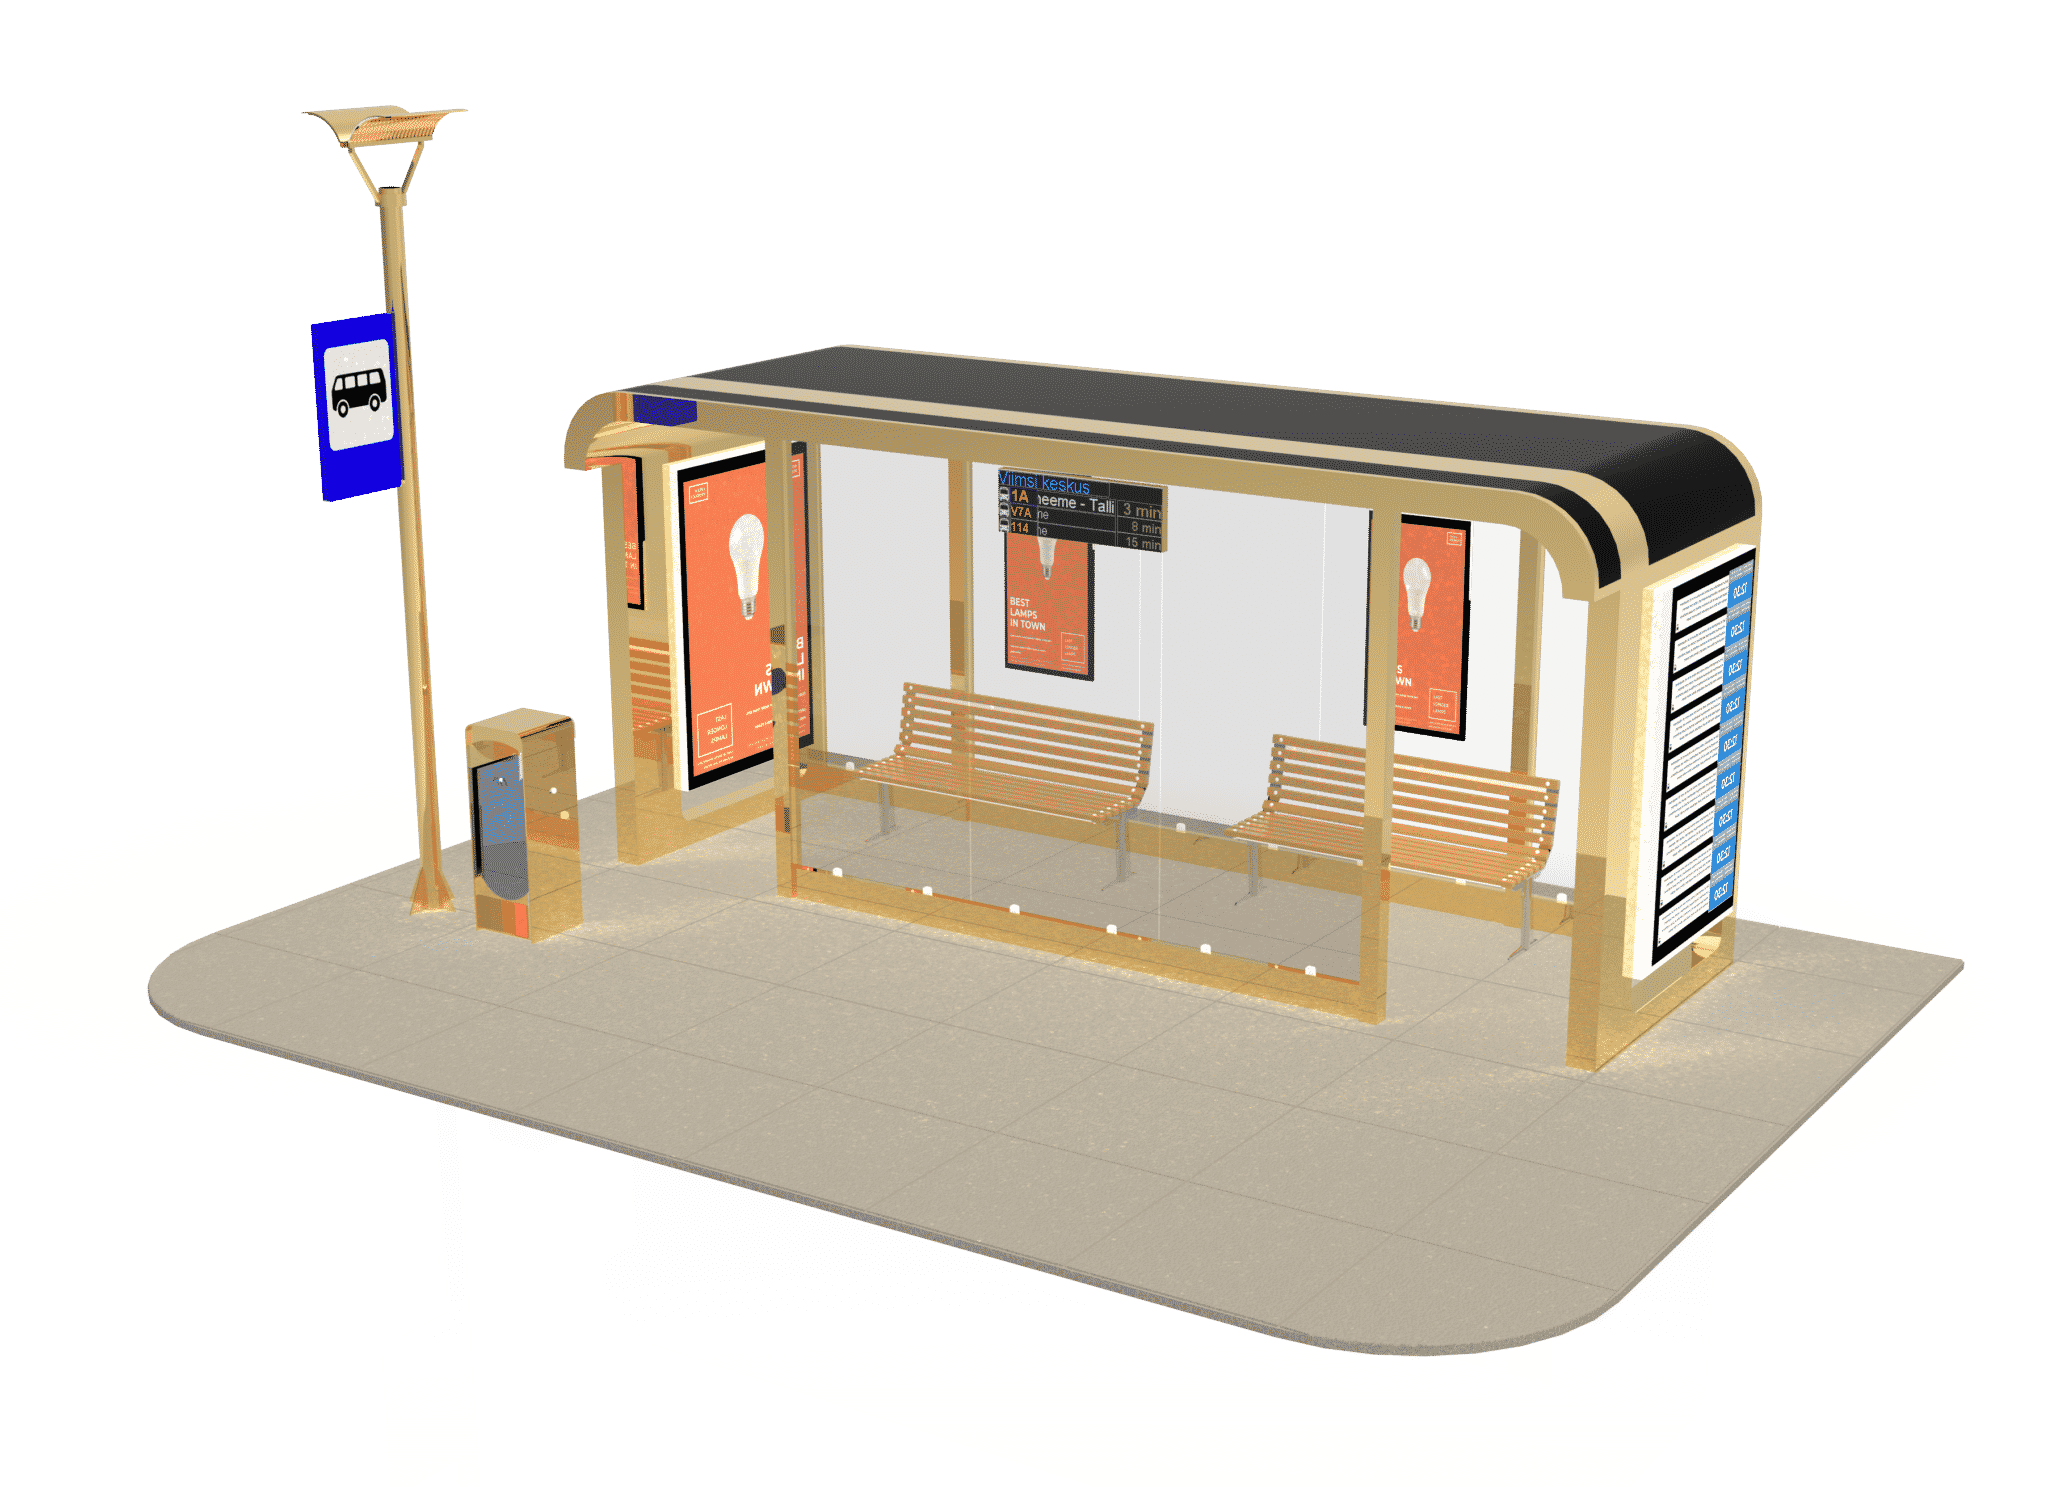 Bus_Stop_rendering_v3_Gold